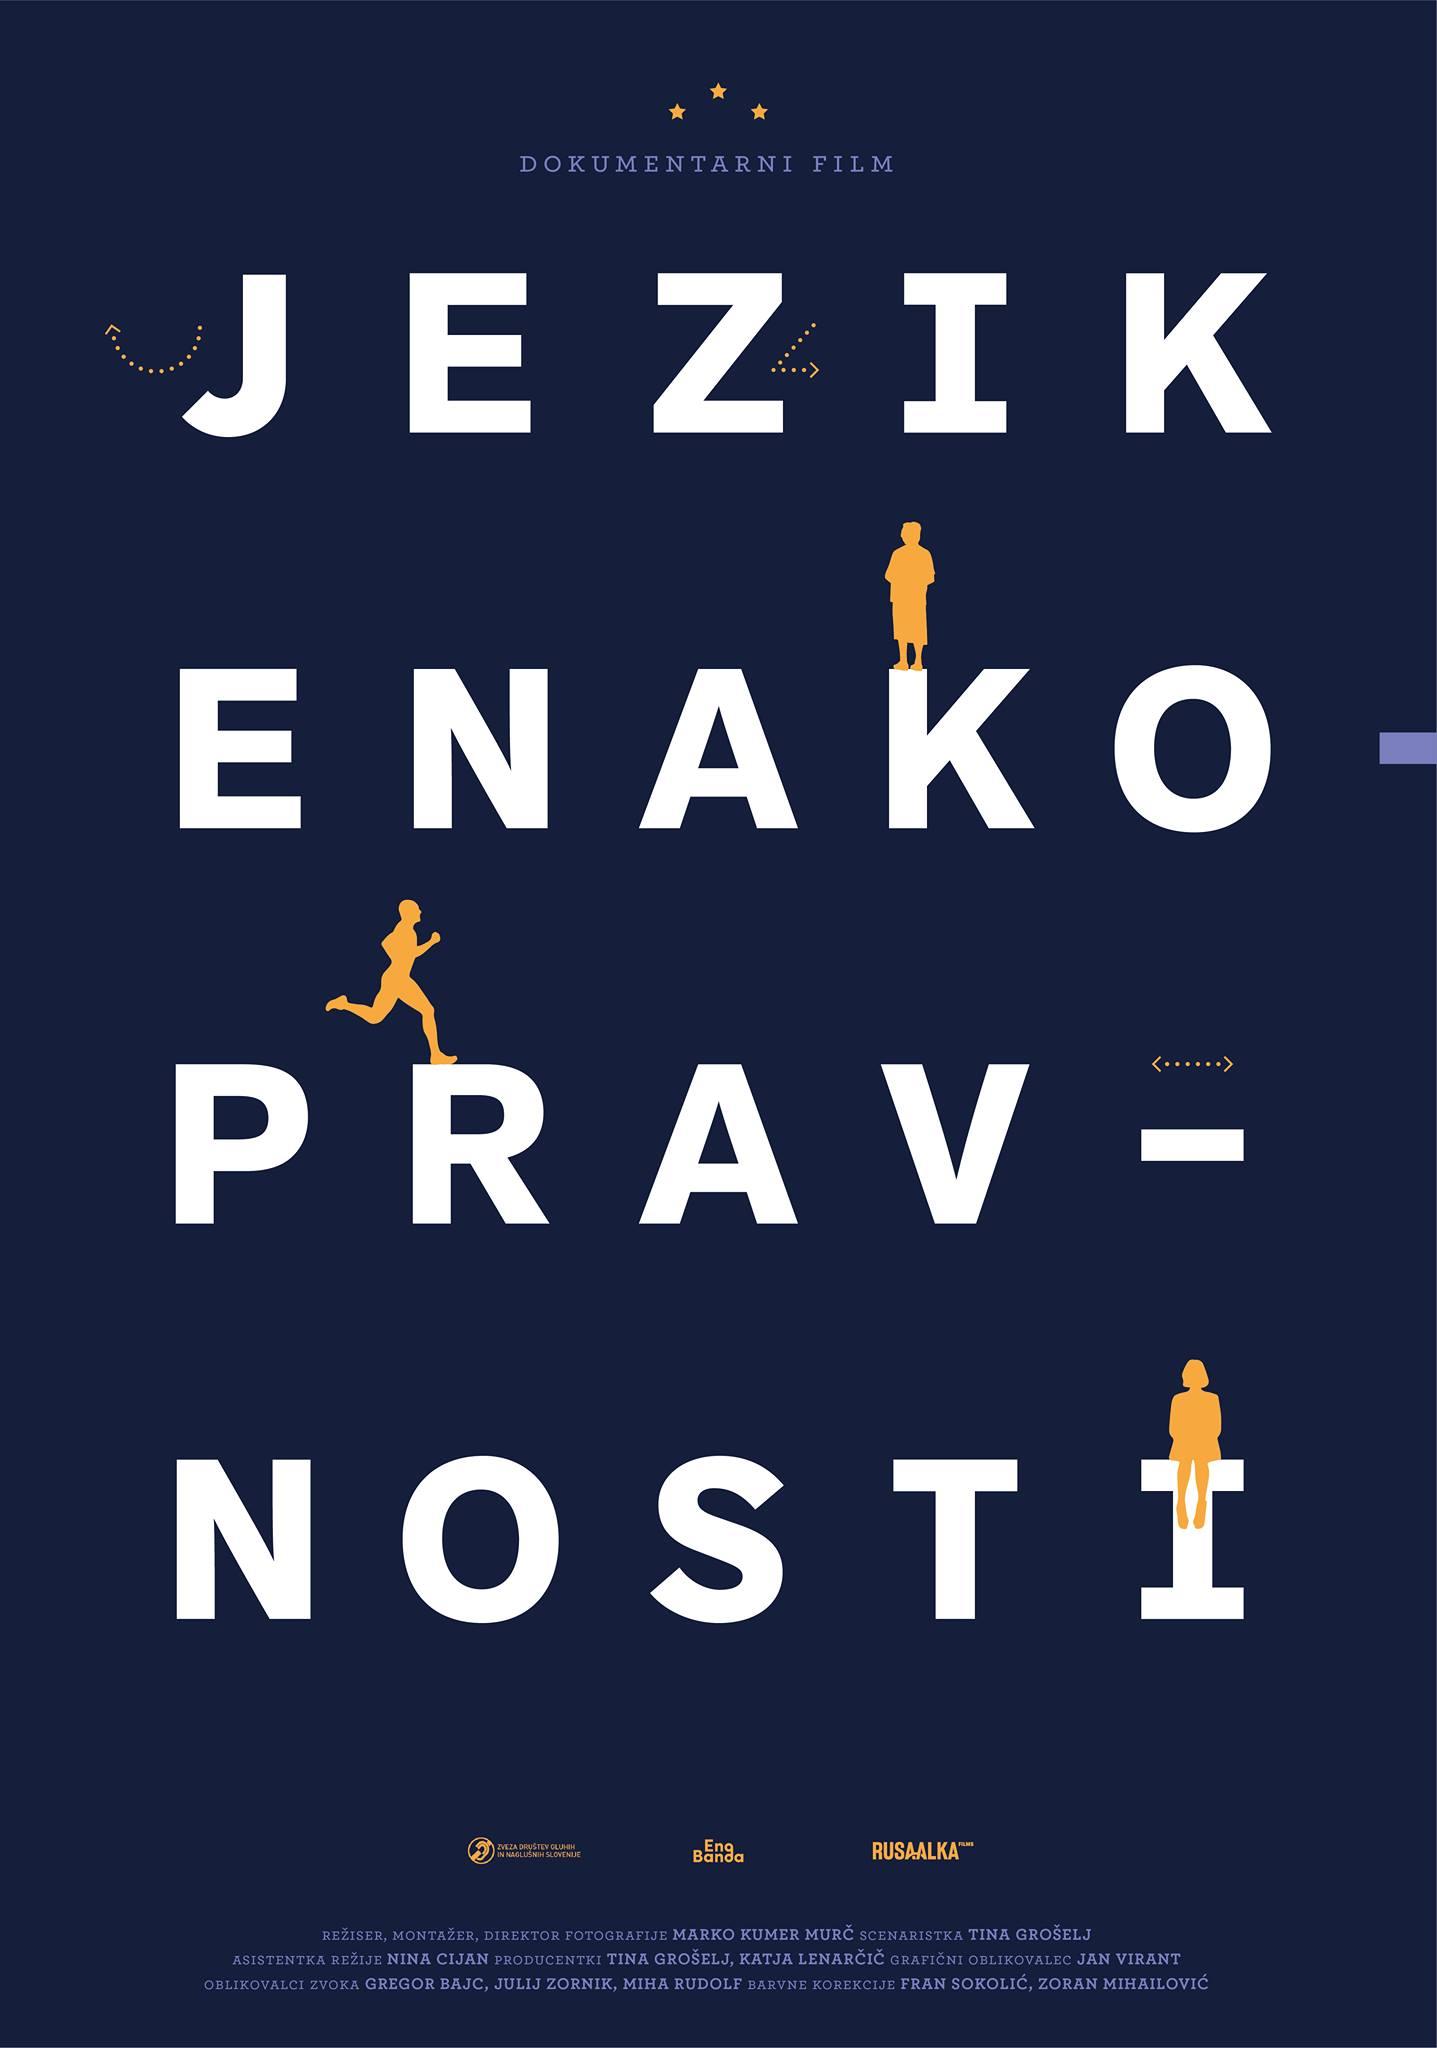 Language of Equality by Marko Kumer from Slovenia